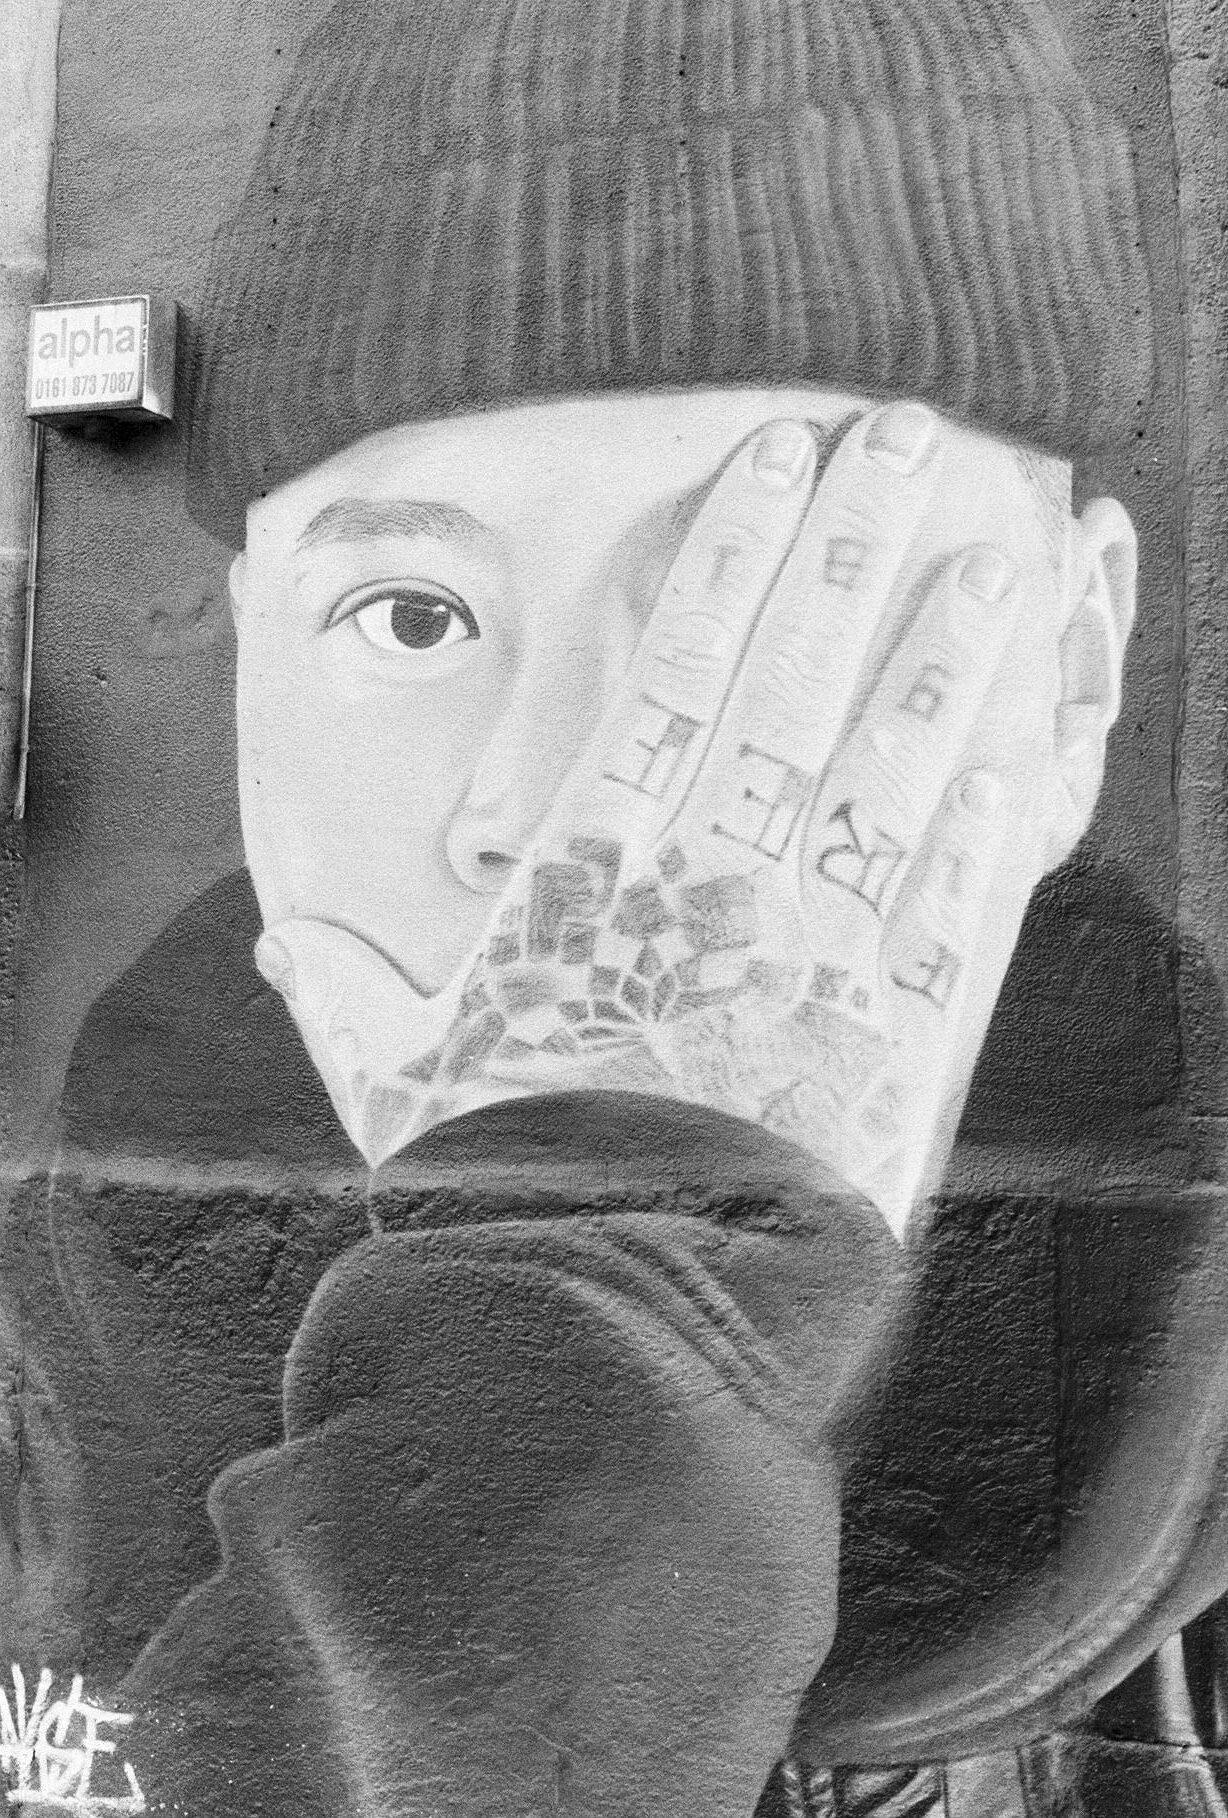 5. Stevenson Square mural (@akse_p19), Northern Quarter – Kentmere 400, Pentax ME